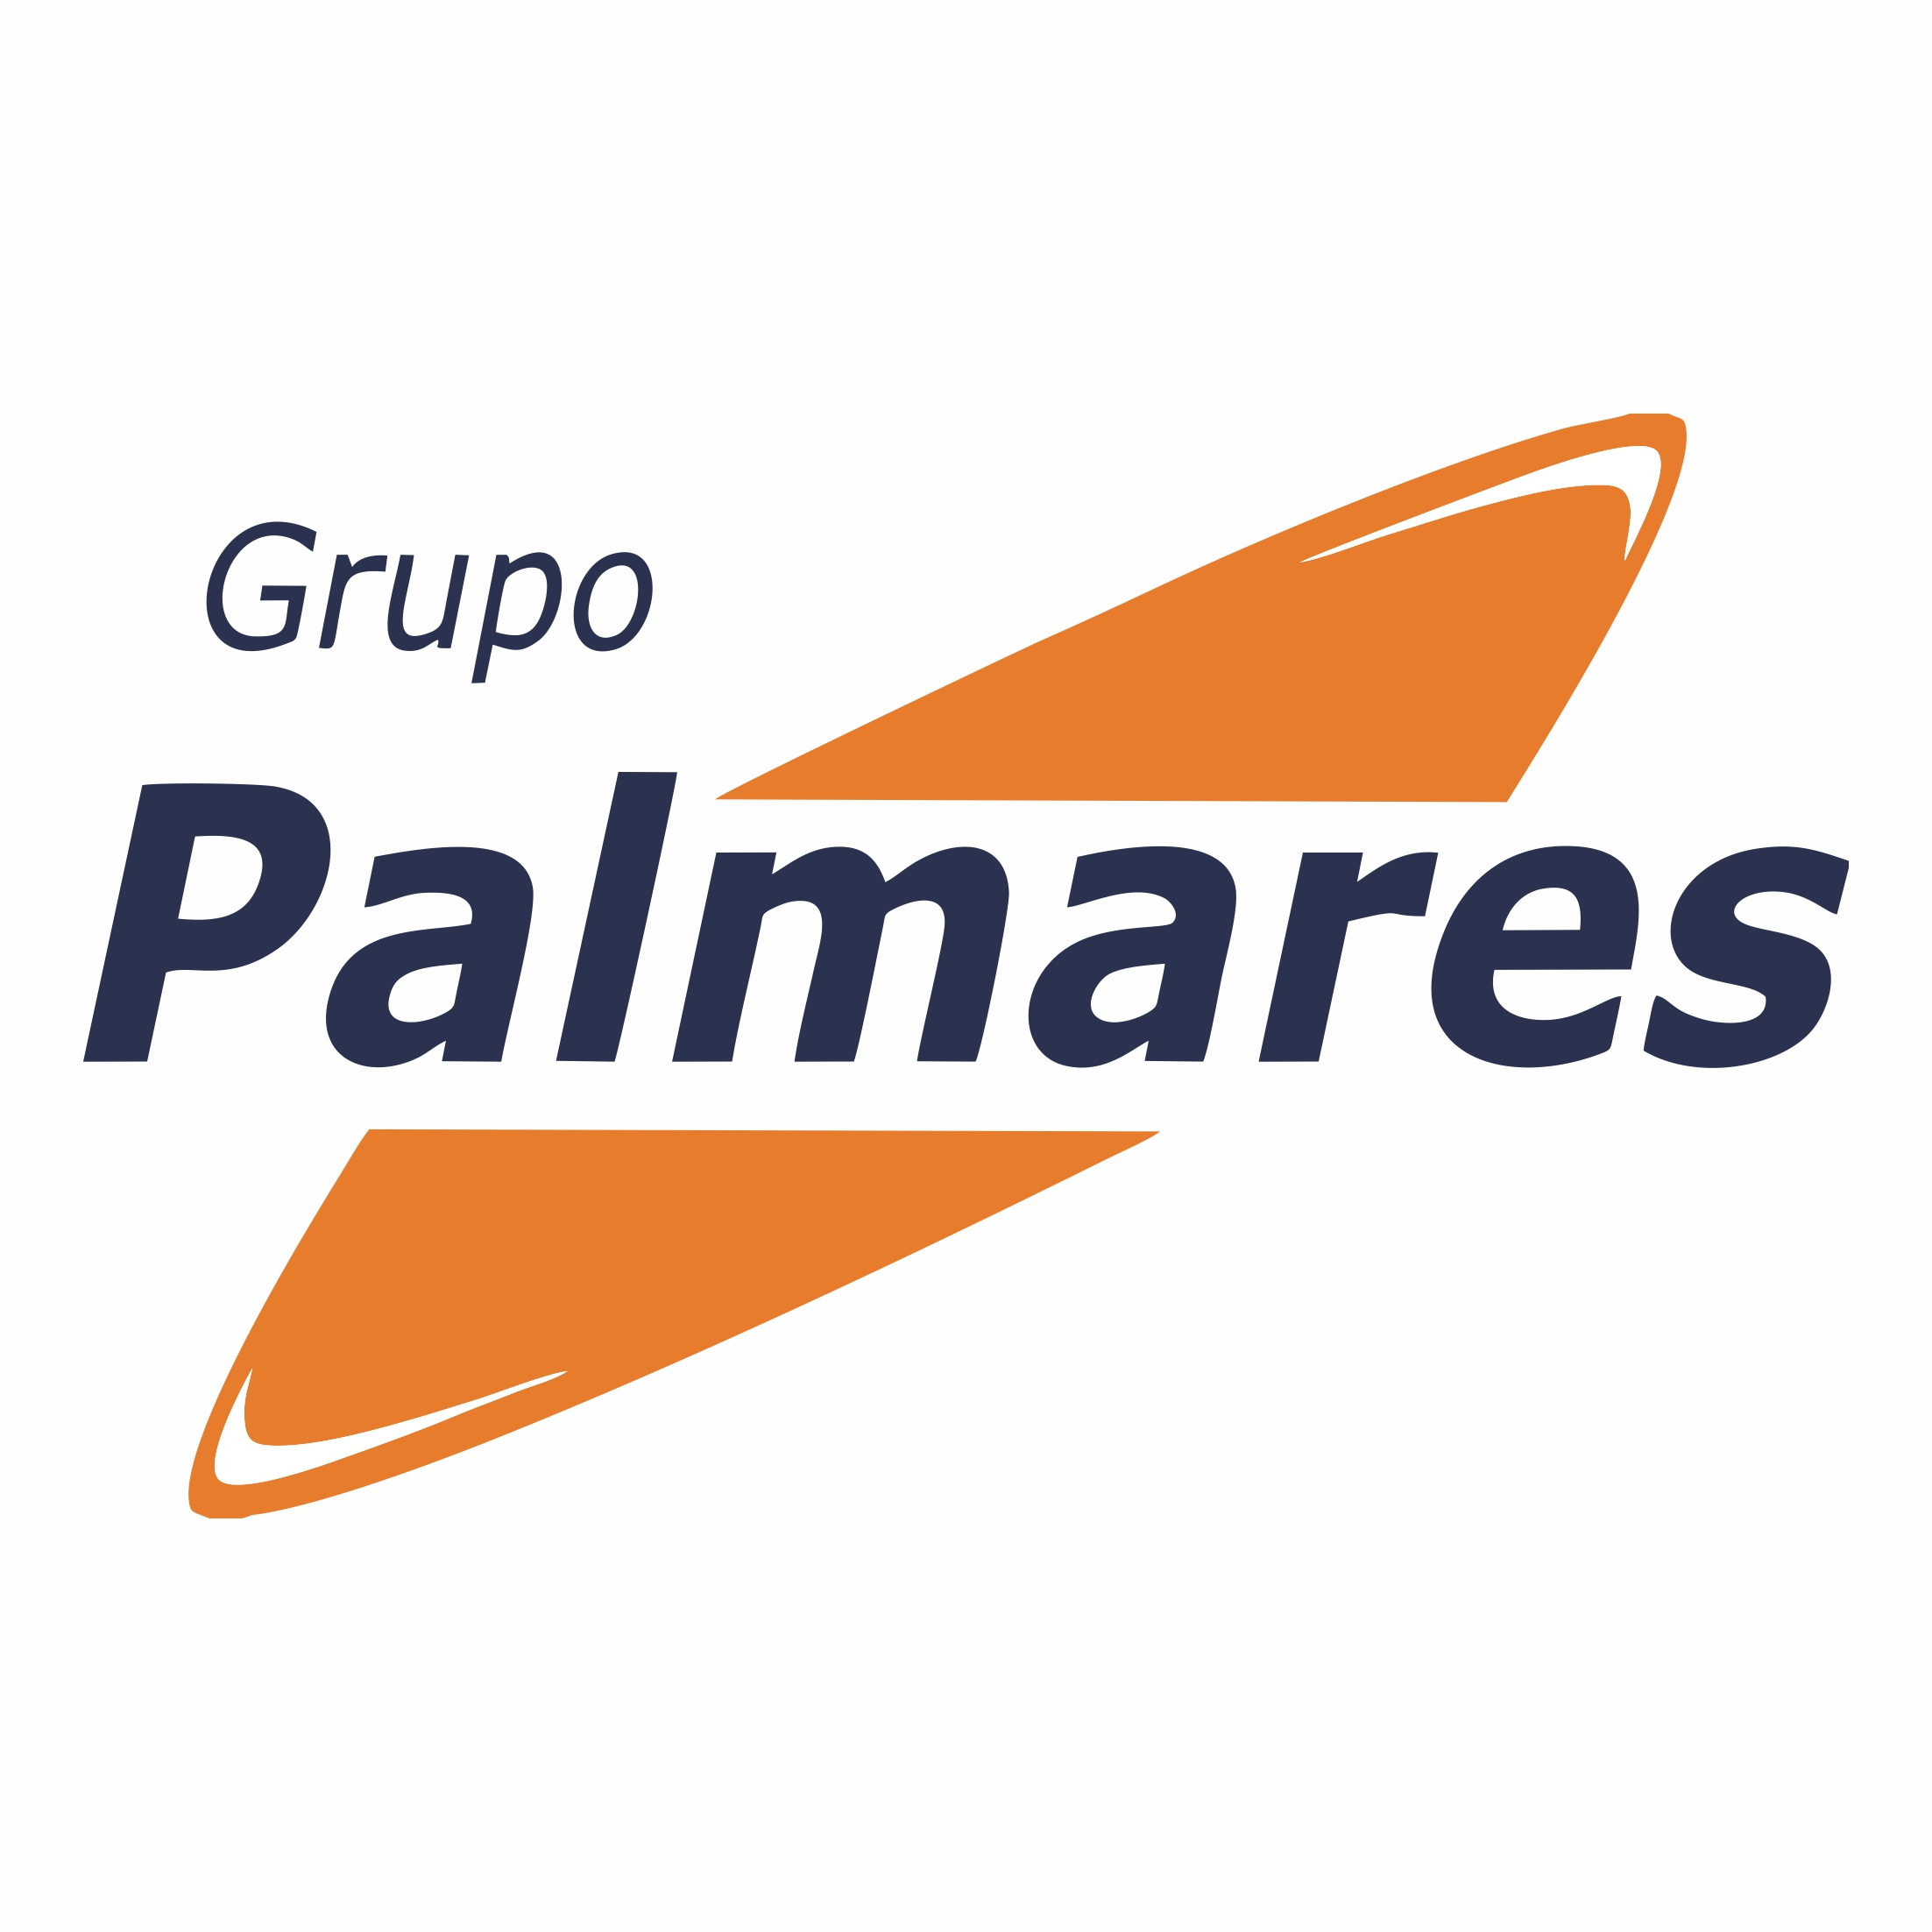 Grupo Palmares